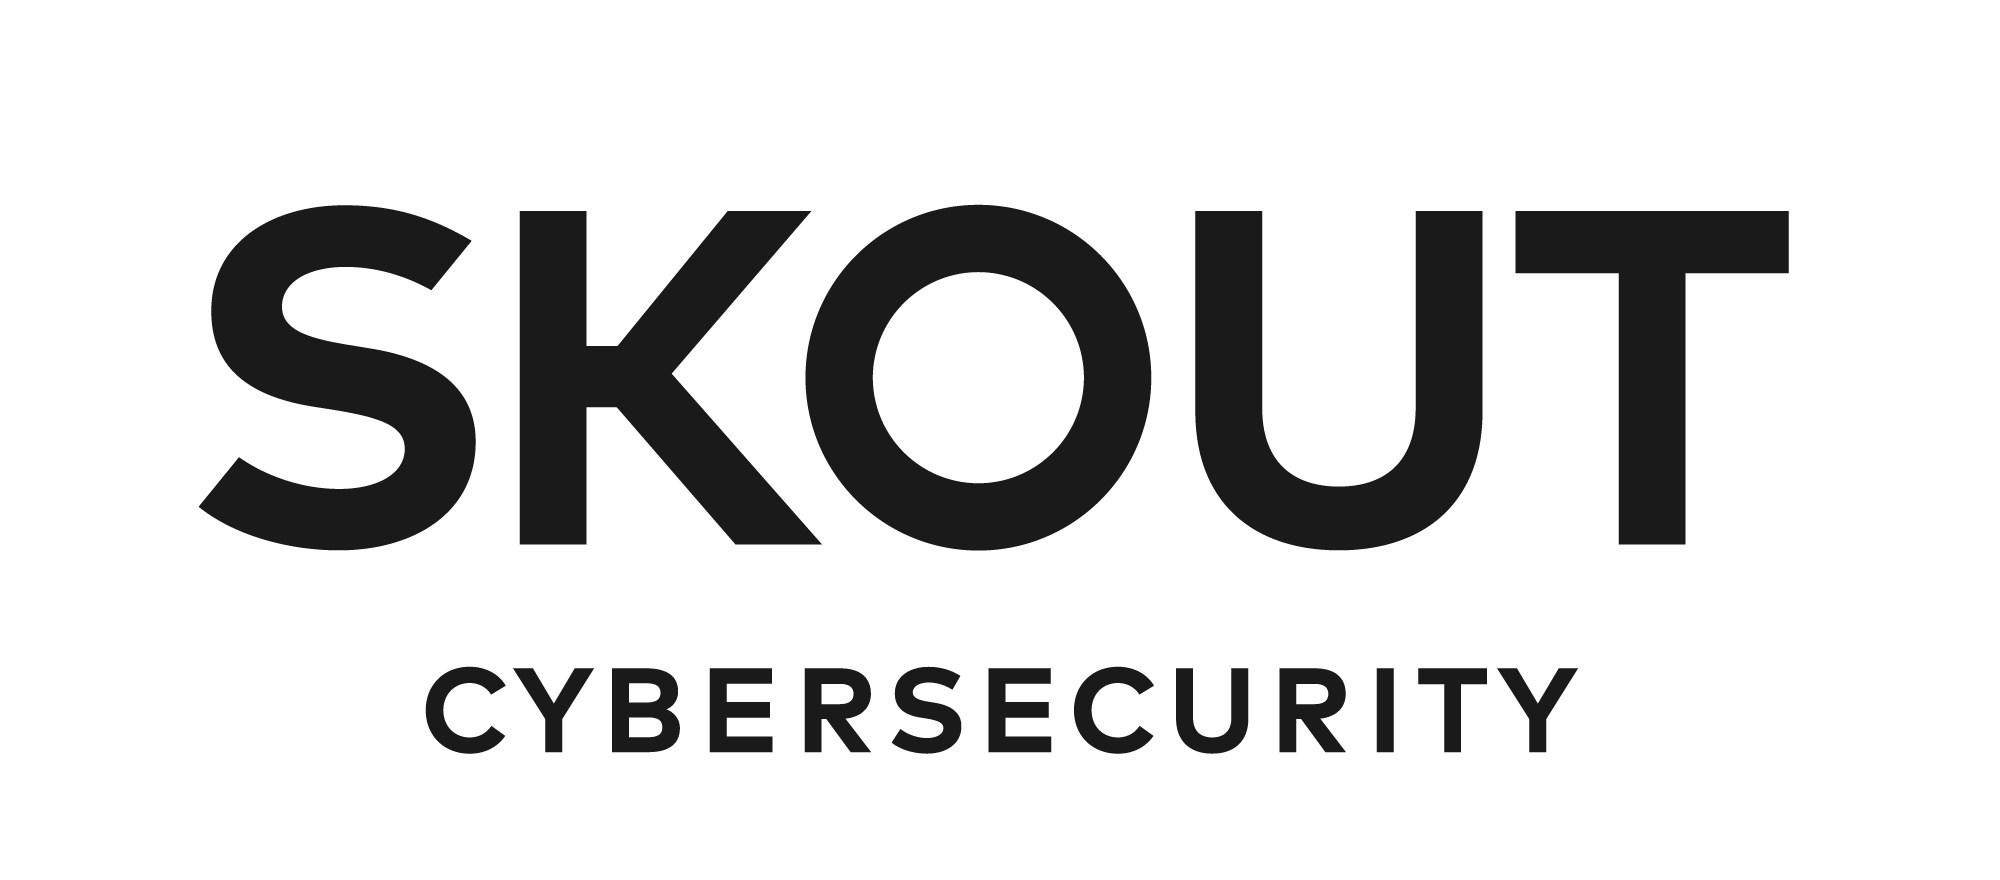 SKOUT CYBERSECURITY Appoints Industry Veteran Mike Hanauer